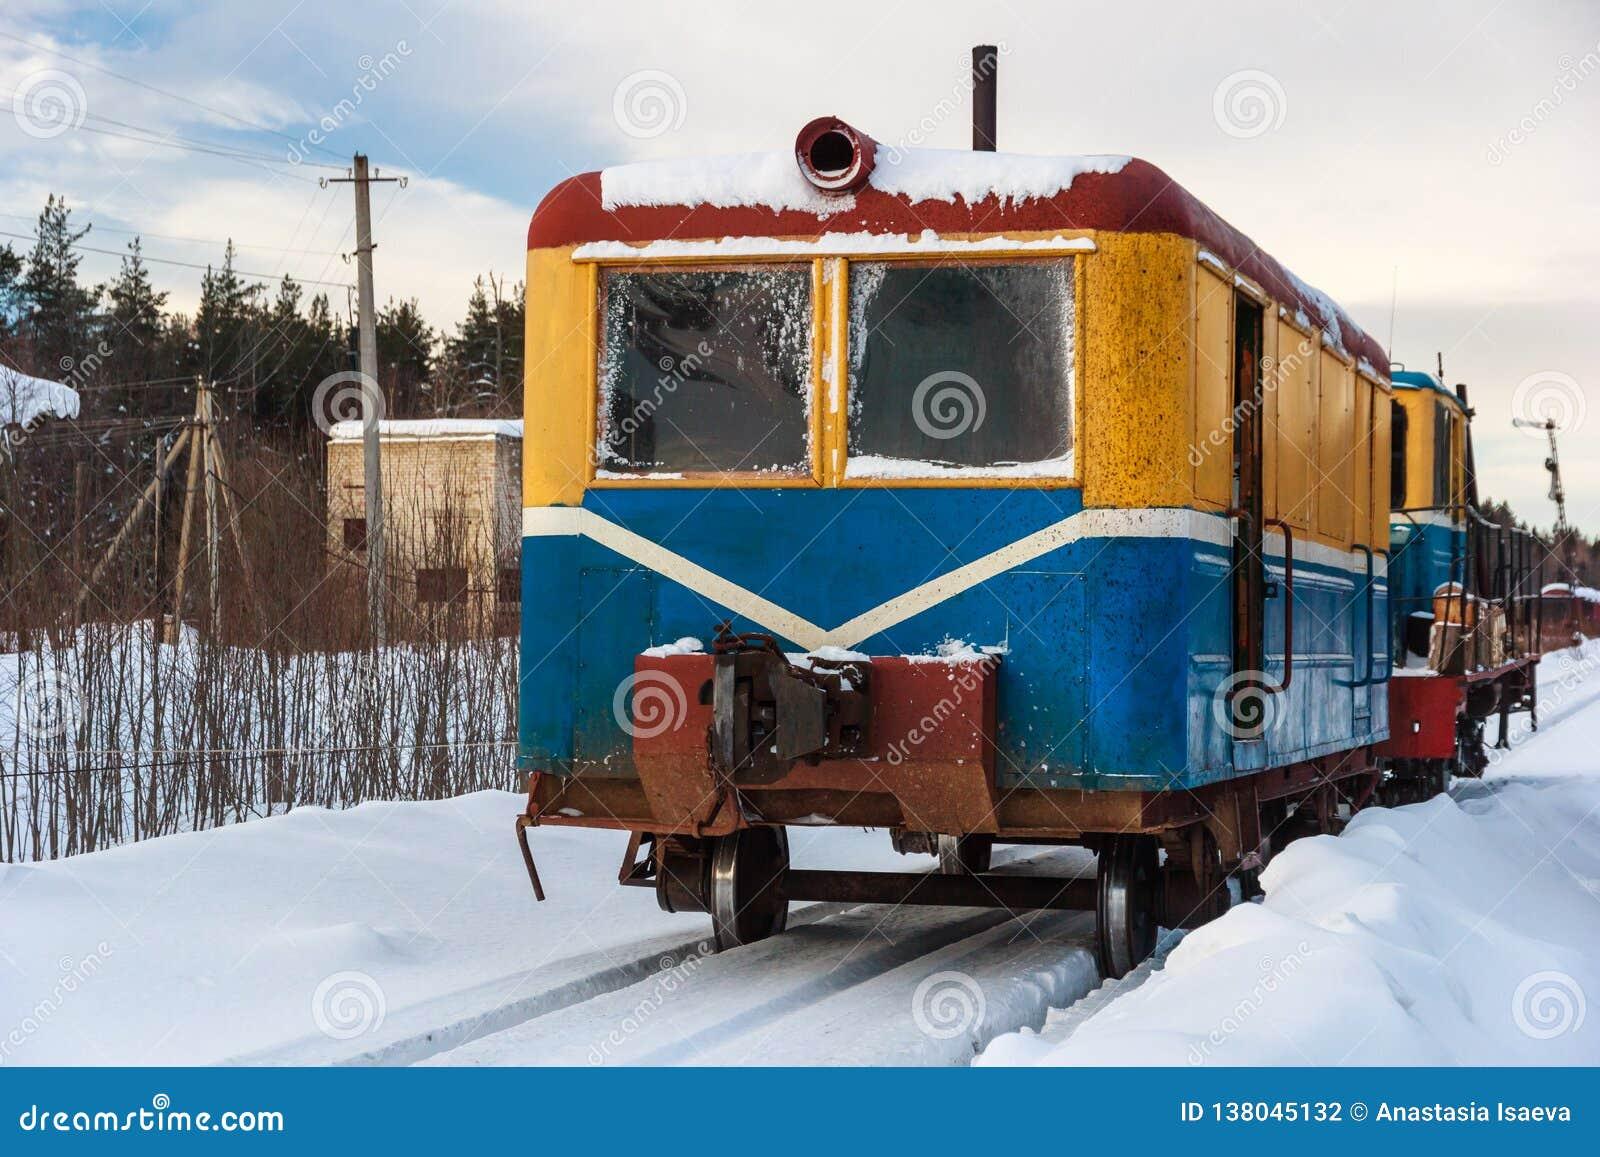 Veículo da estrada de ferro de Monza na cidade de Soligalich